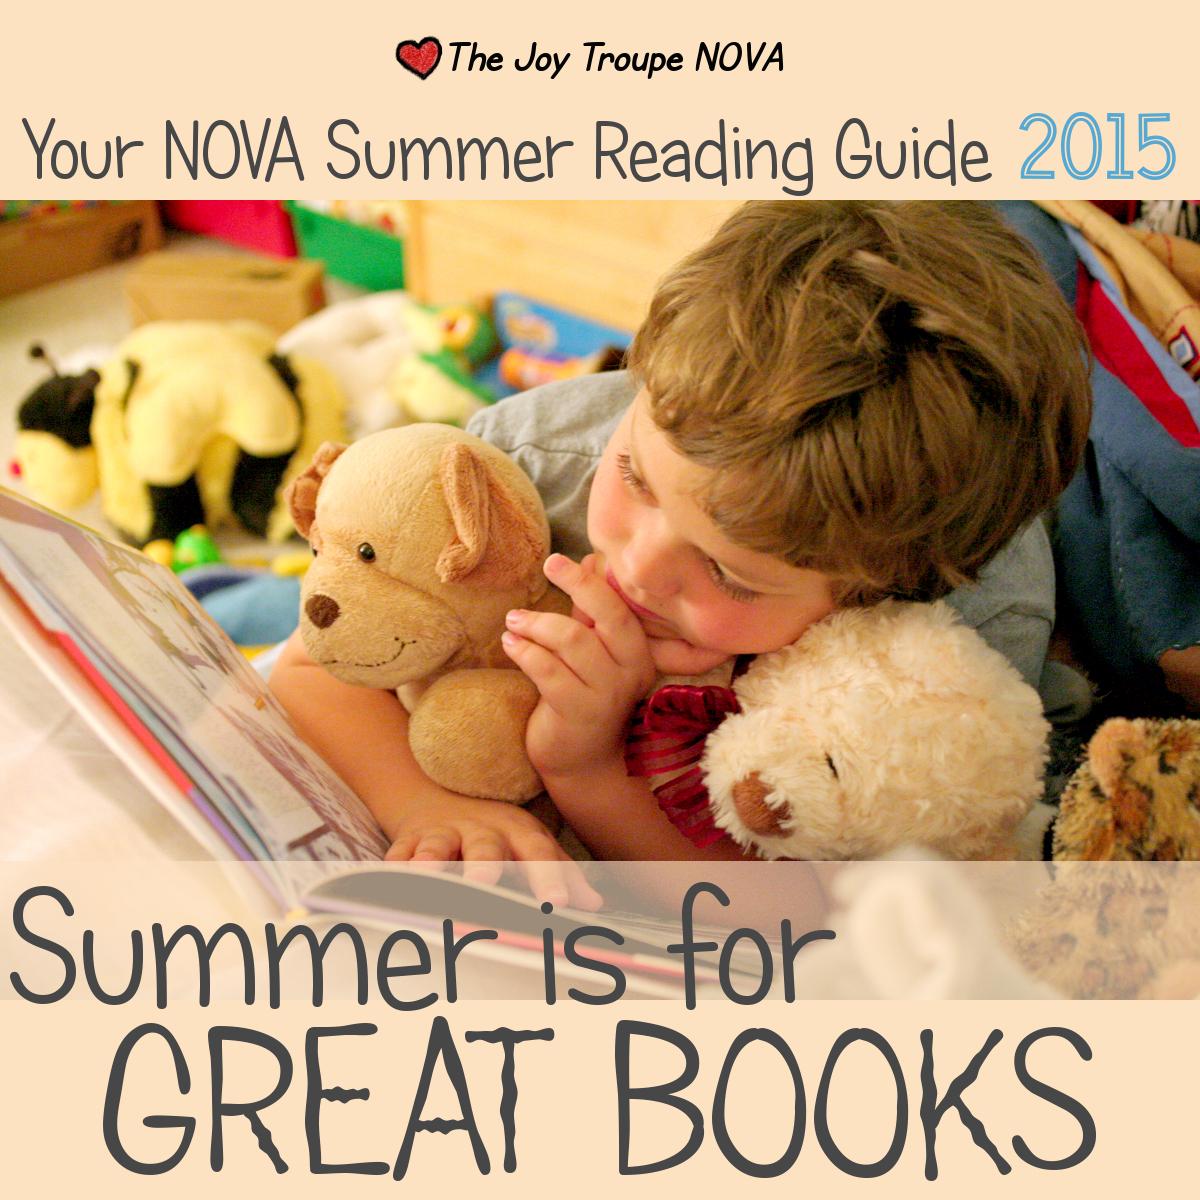 summer reading guide 2015 Joy Troupe NOVA